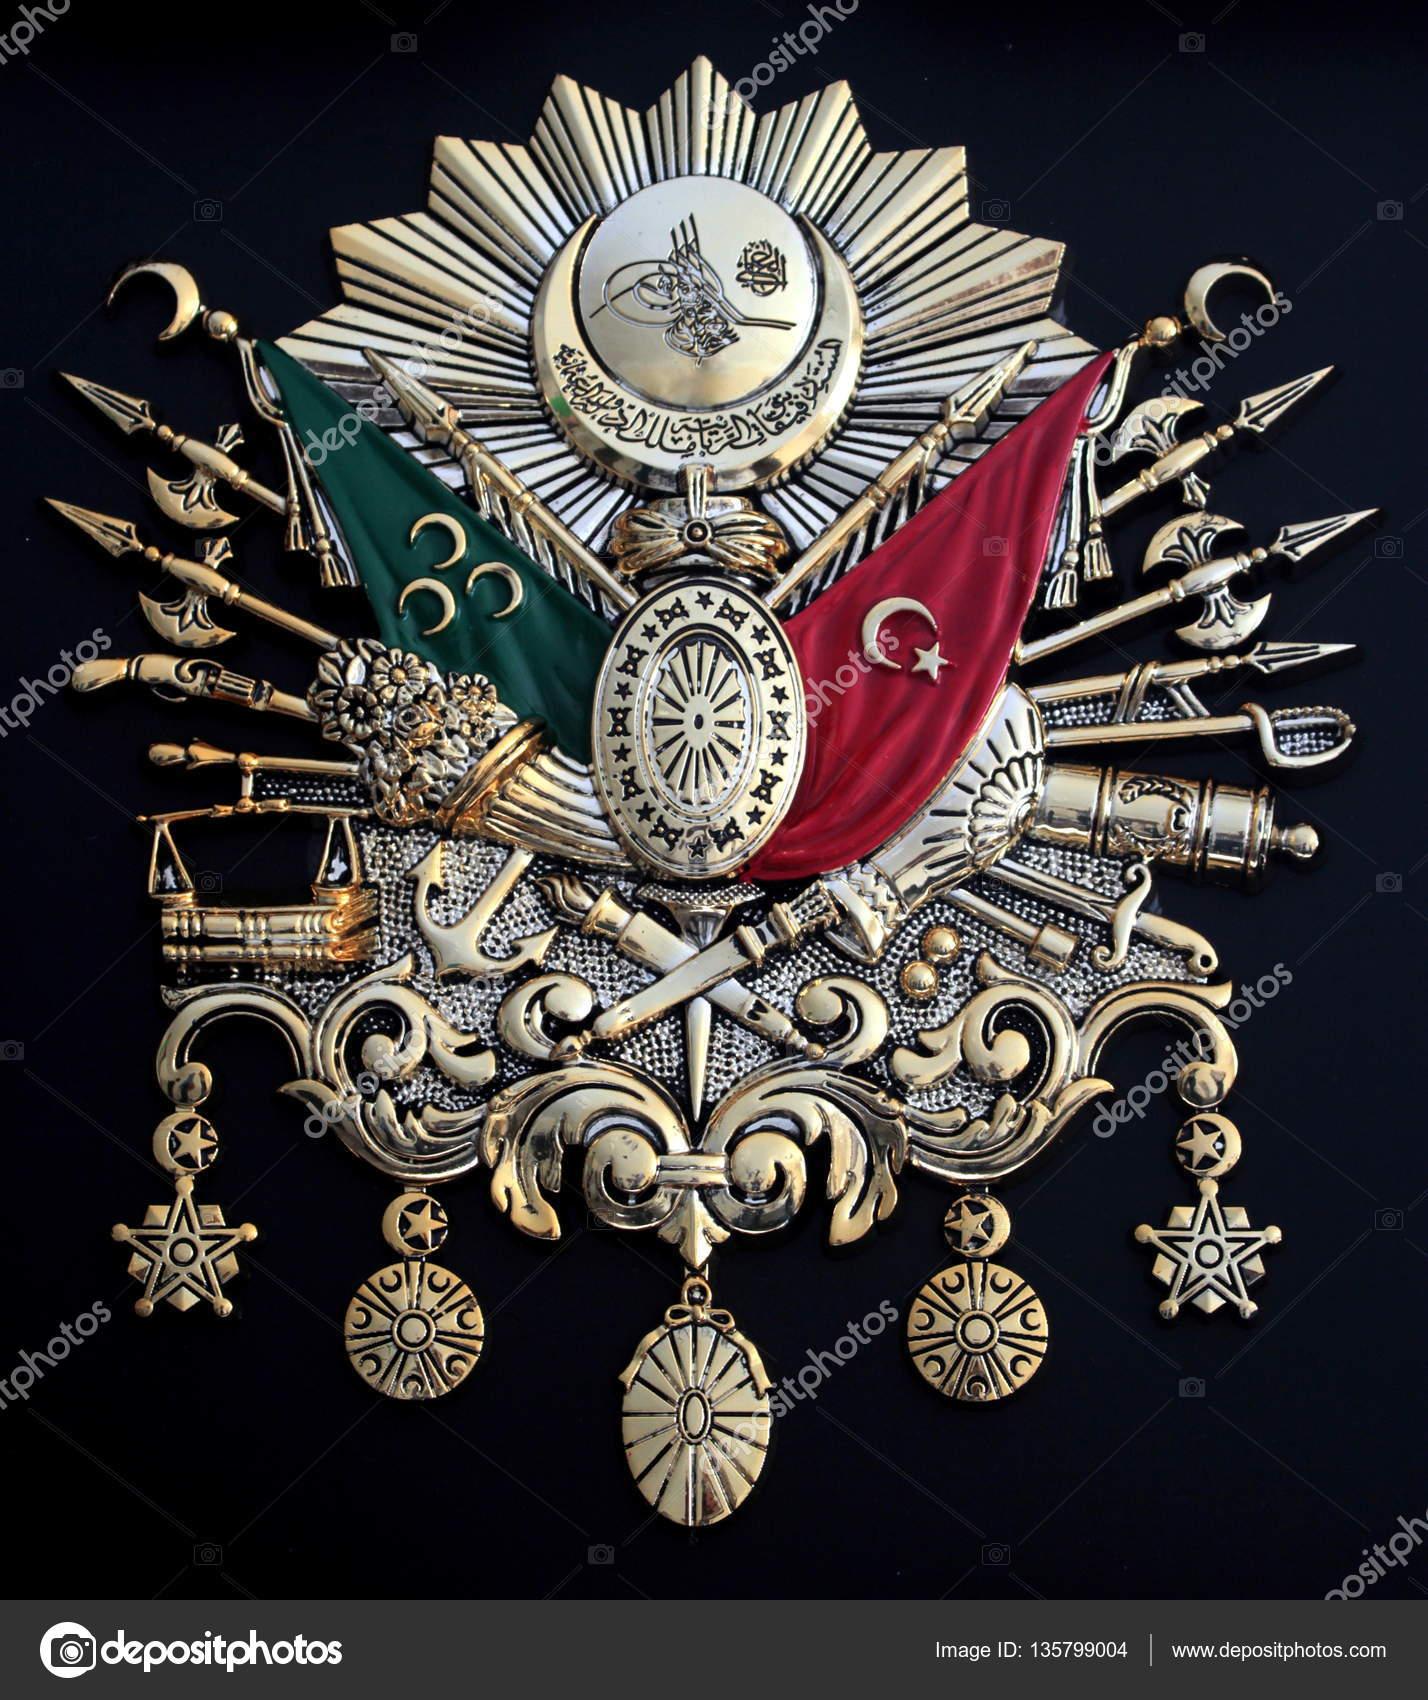 Ottoman empire emblem old turkish symbol stock photo ottoman empire emblem old turkish symbol stock photo buycottarizona